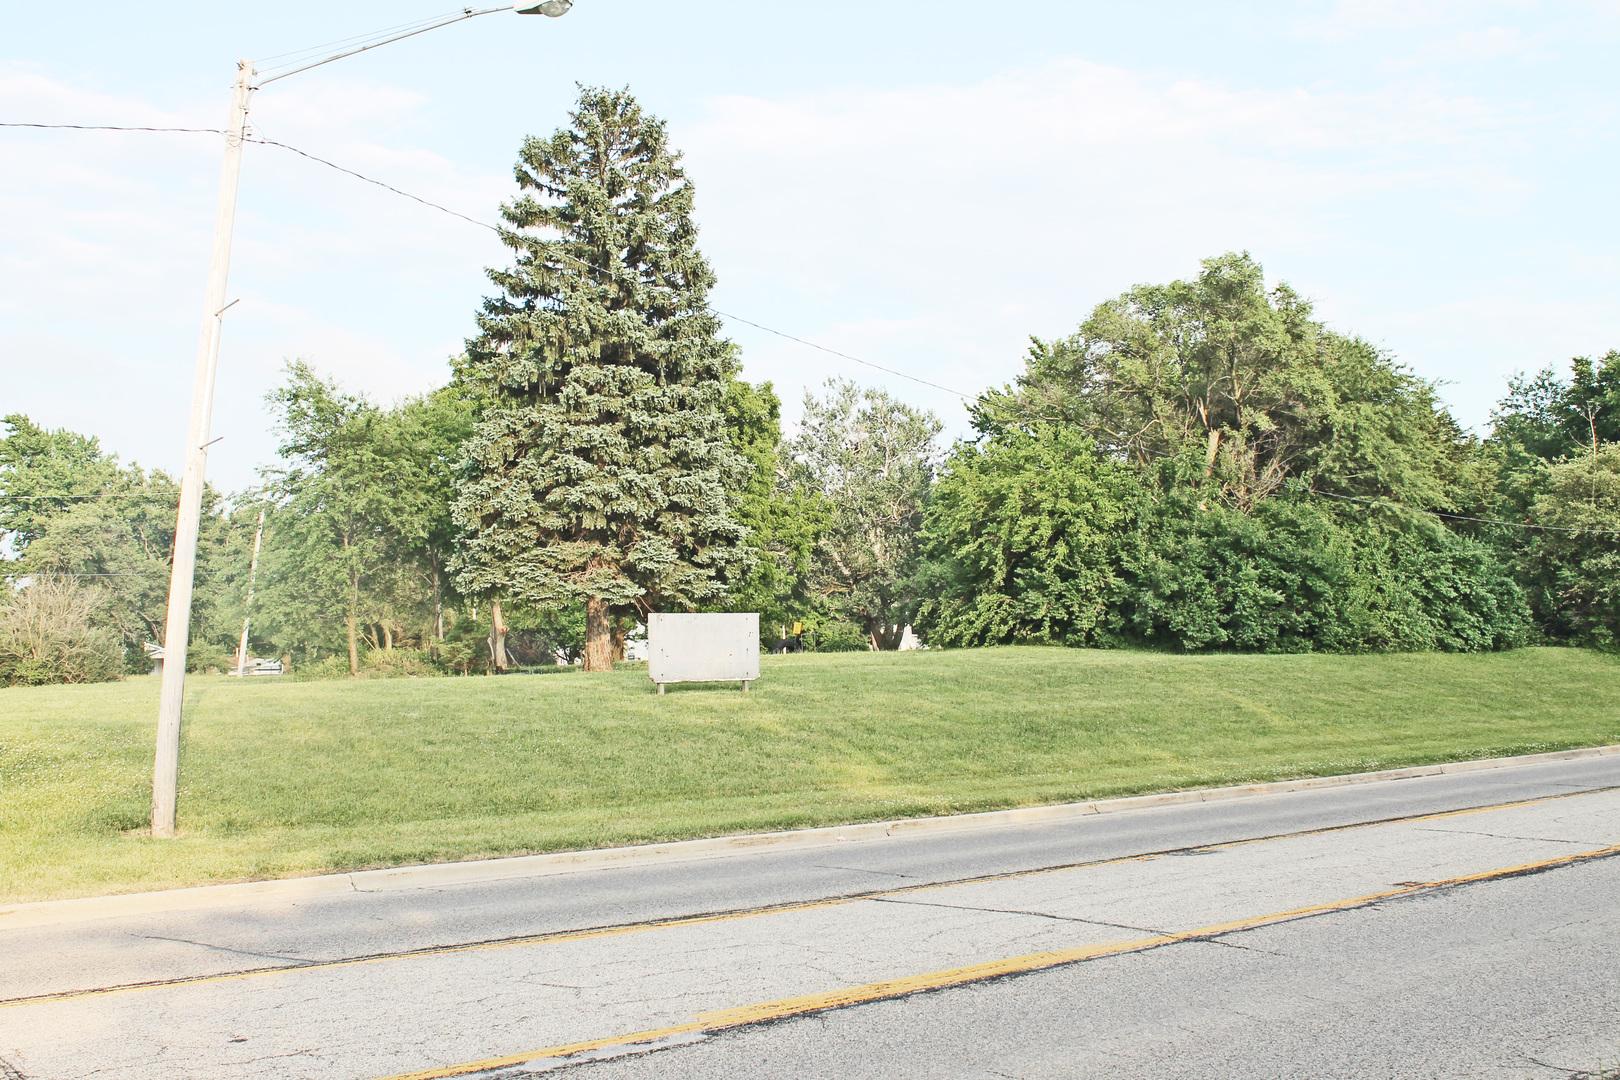 216 N Dixie Highway, Hoopeston, IL 60942